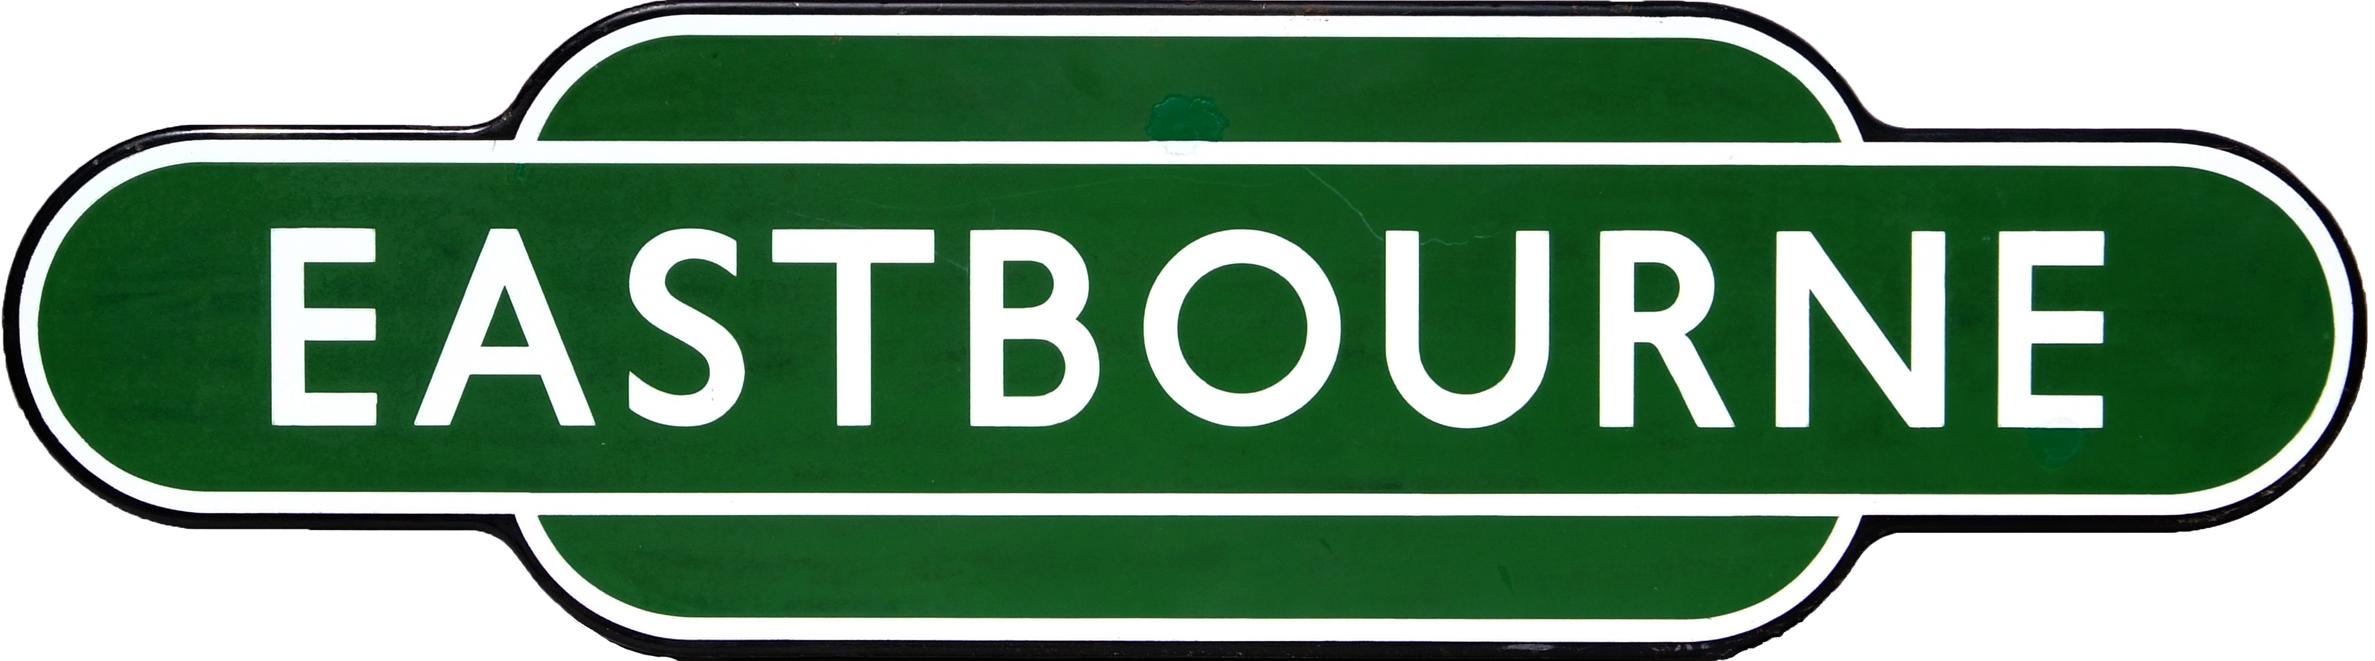 Totem BR(S) EASTBOURNE, F/F. Ex LBSCR Station